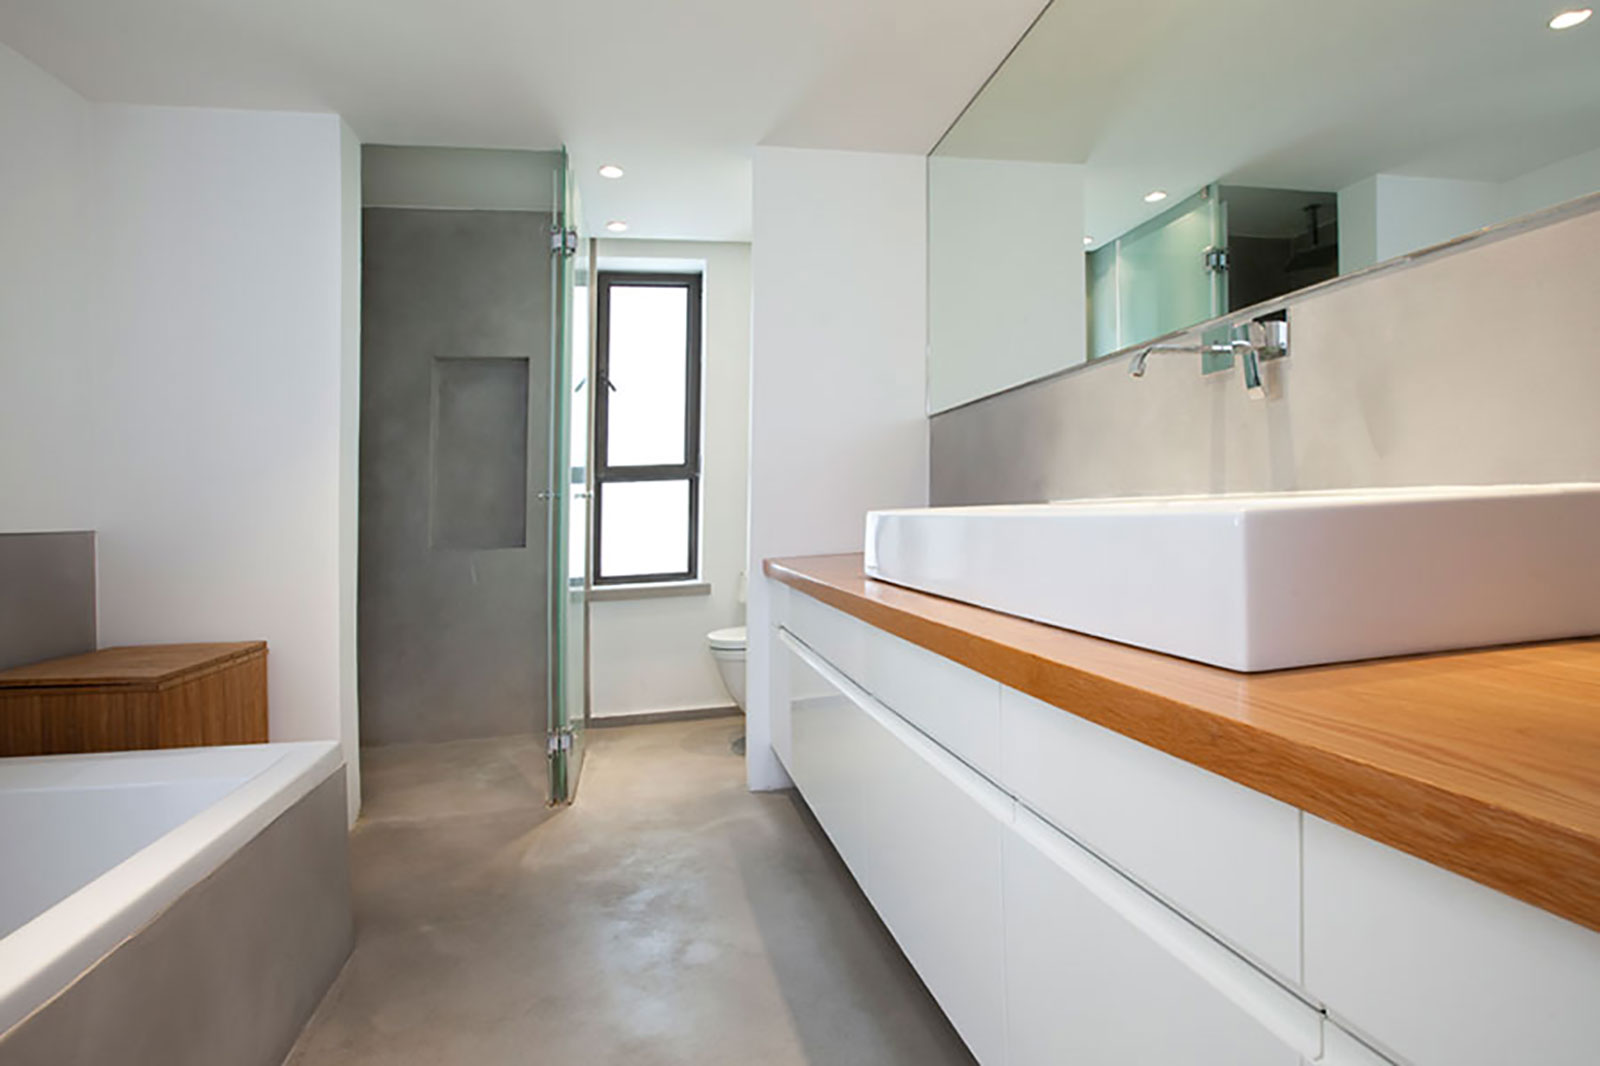 Concrete bathroom by BETONADA (12)